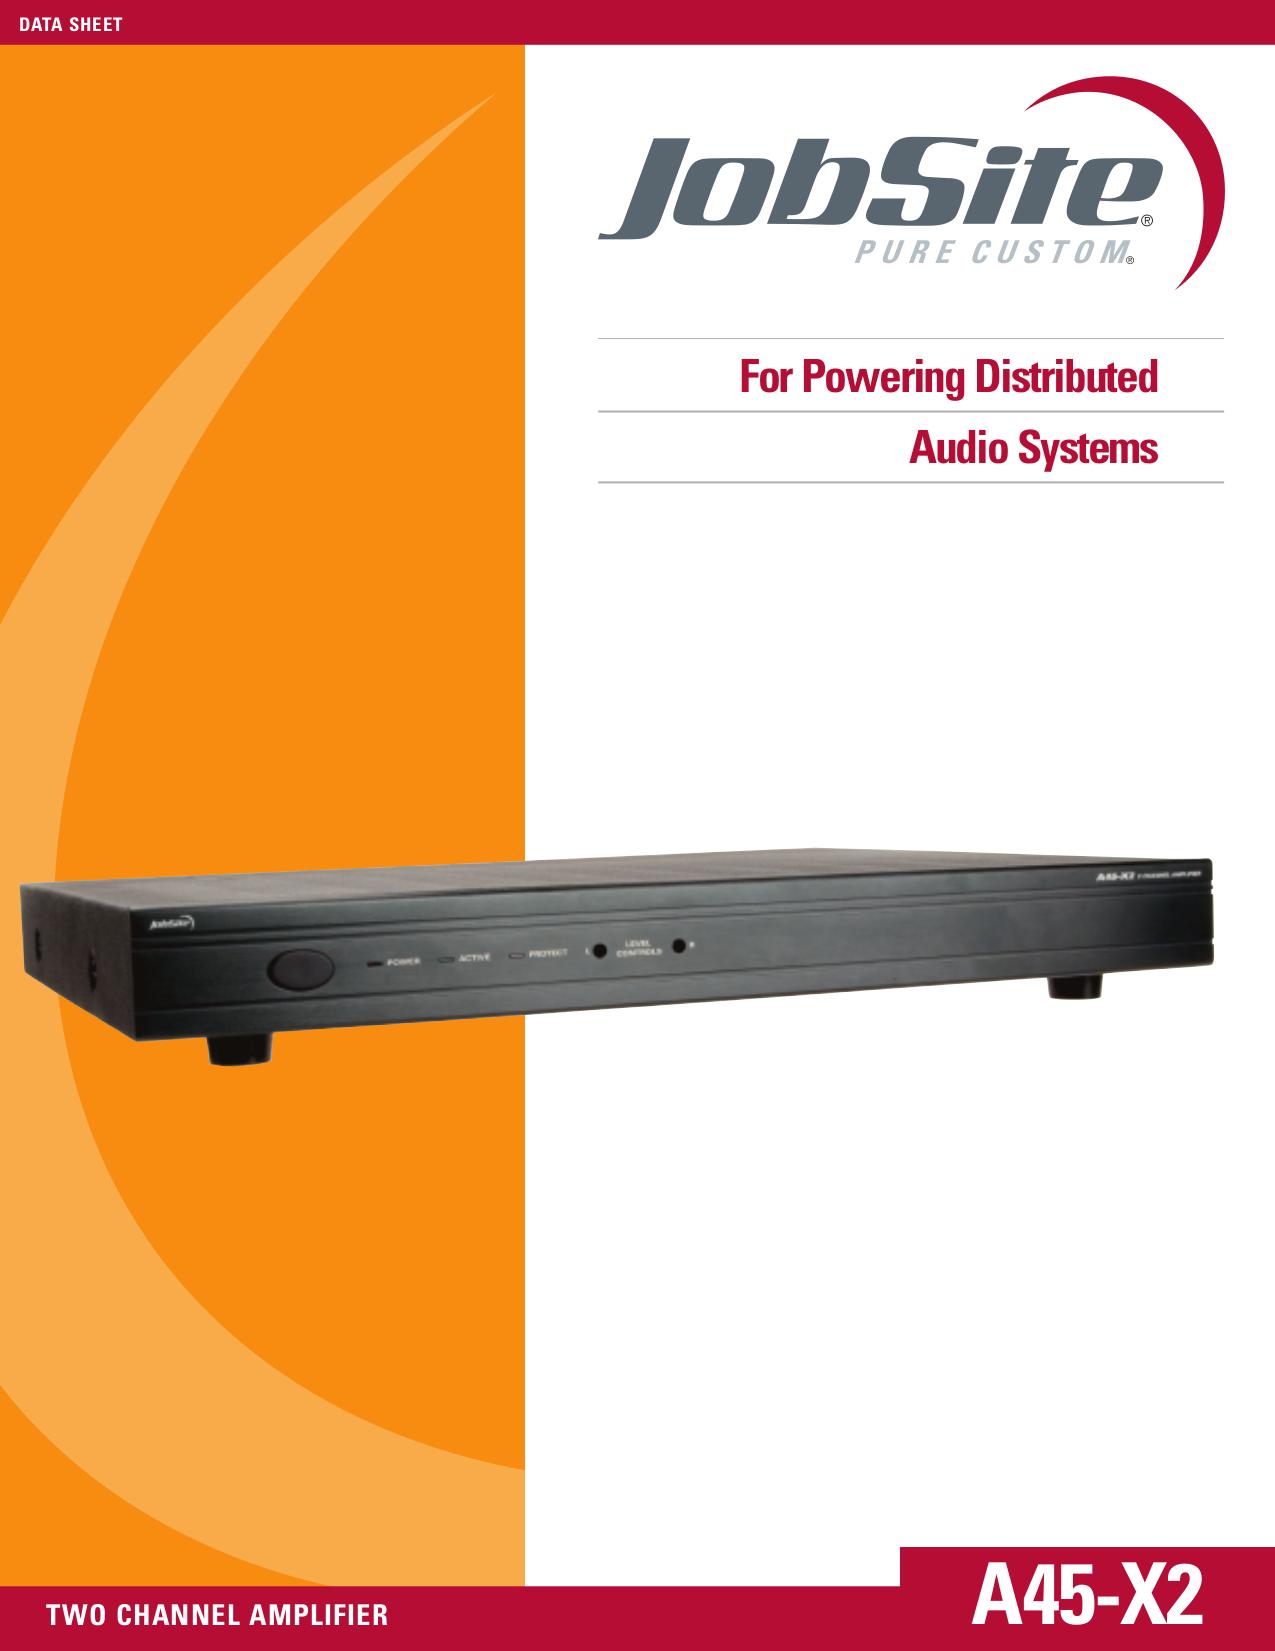 pdf for Jobsite Amp A45-X2 manual